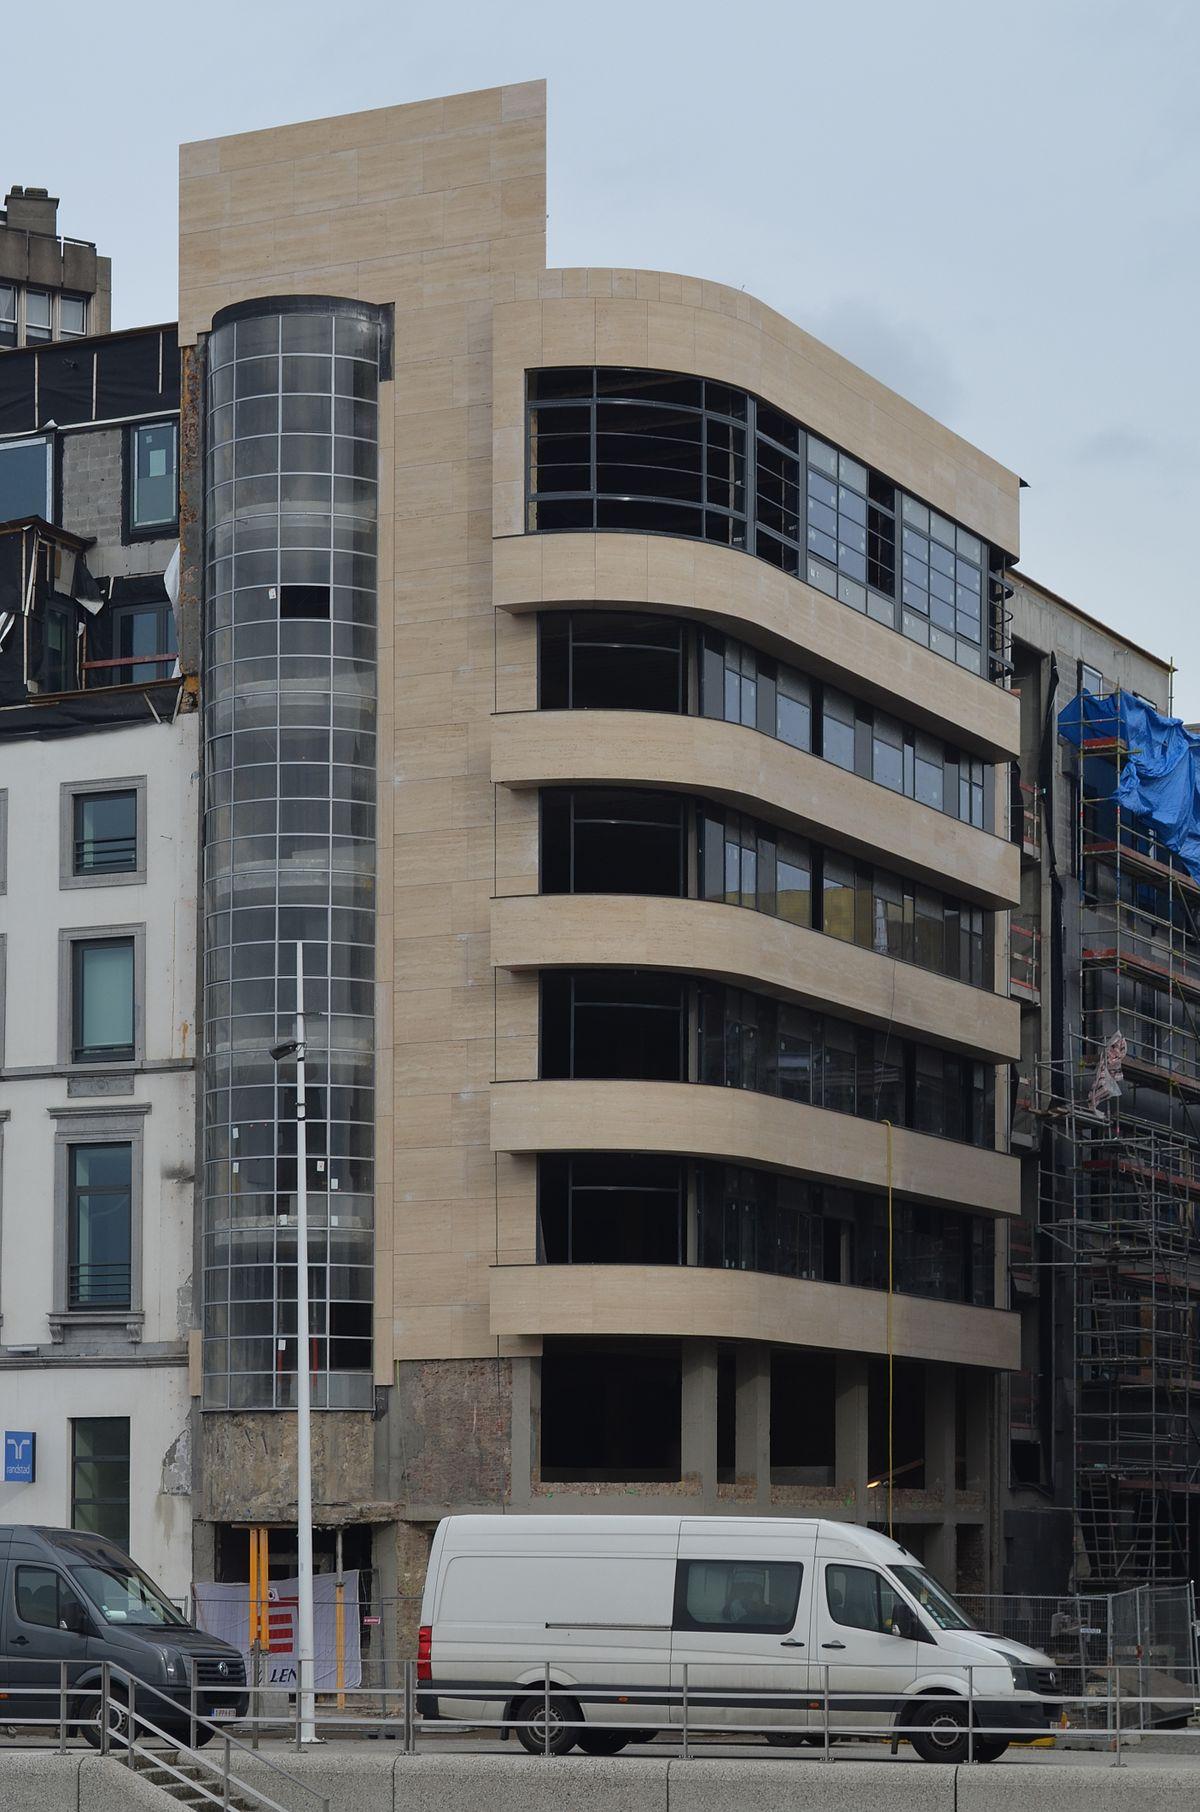 Immeuble de heug wikip dia - Assurer un immeuble en copropriete ...